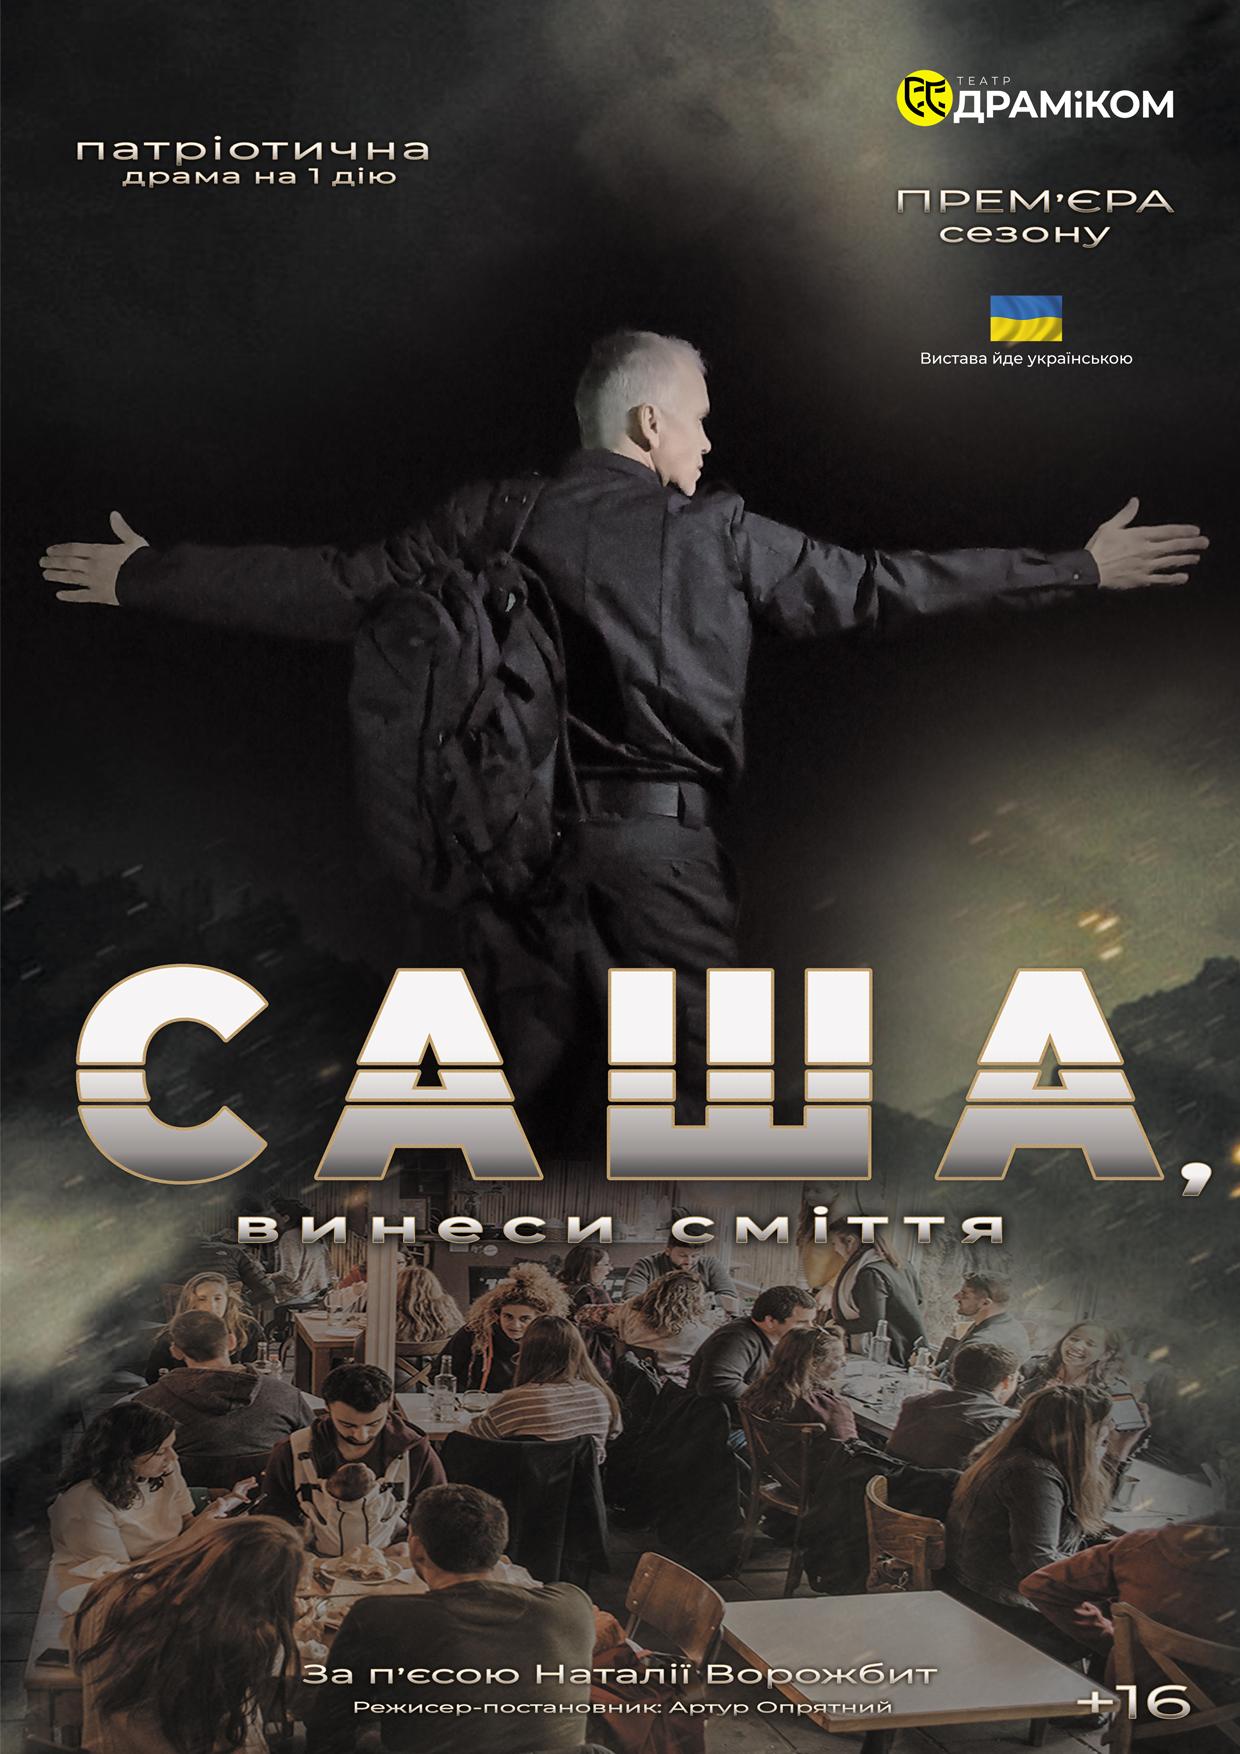 Театр Горького Днепр - ДРАМіКОМ Афіша Саша винеси сміття - драма